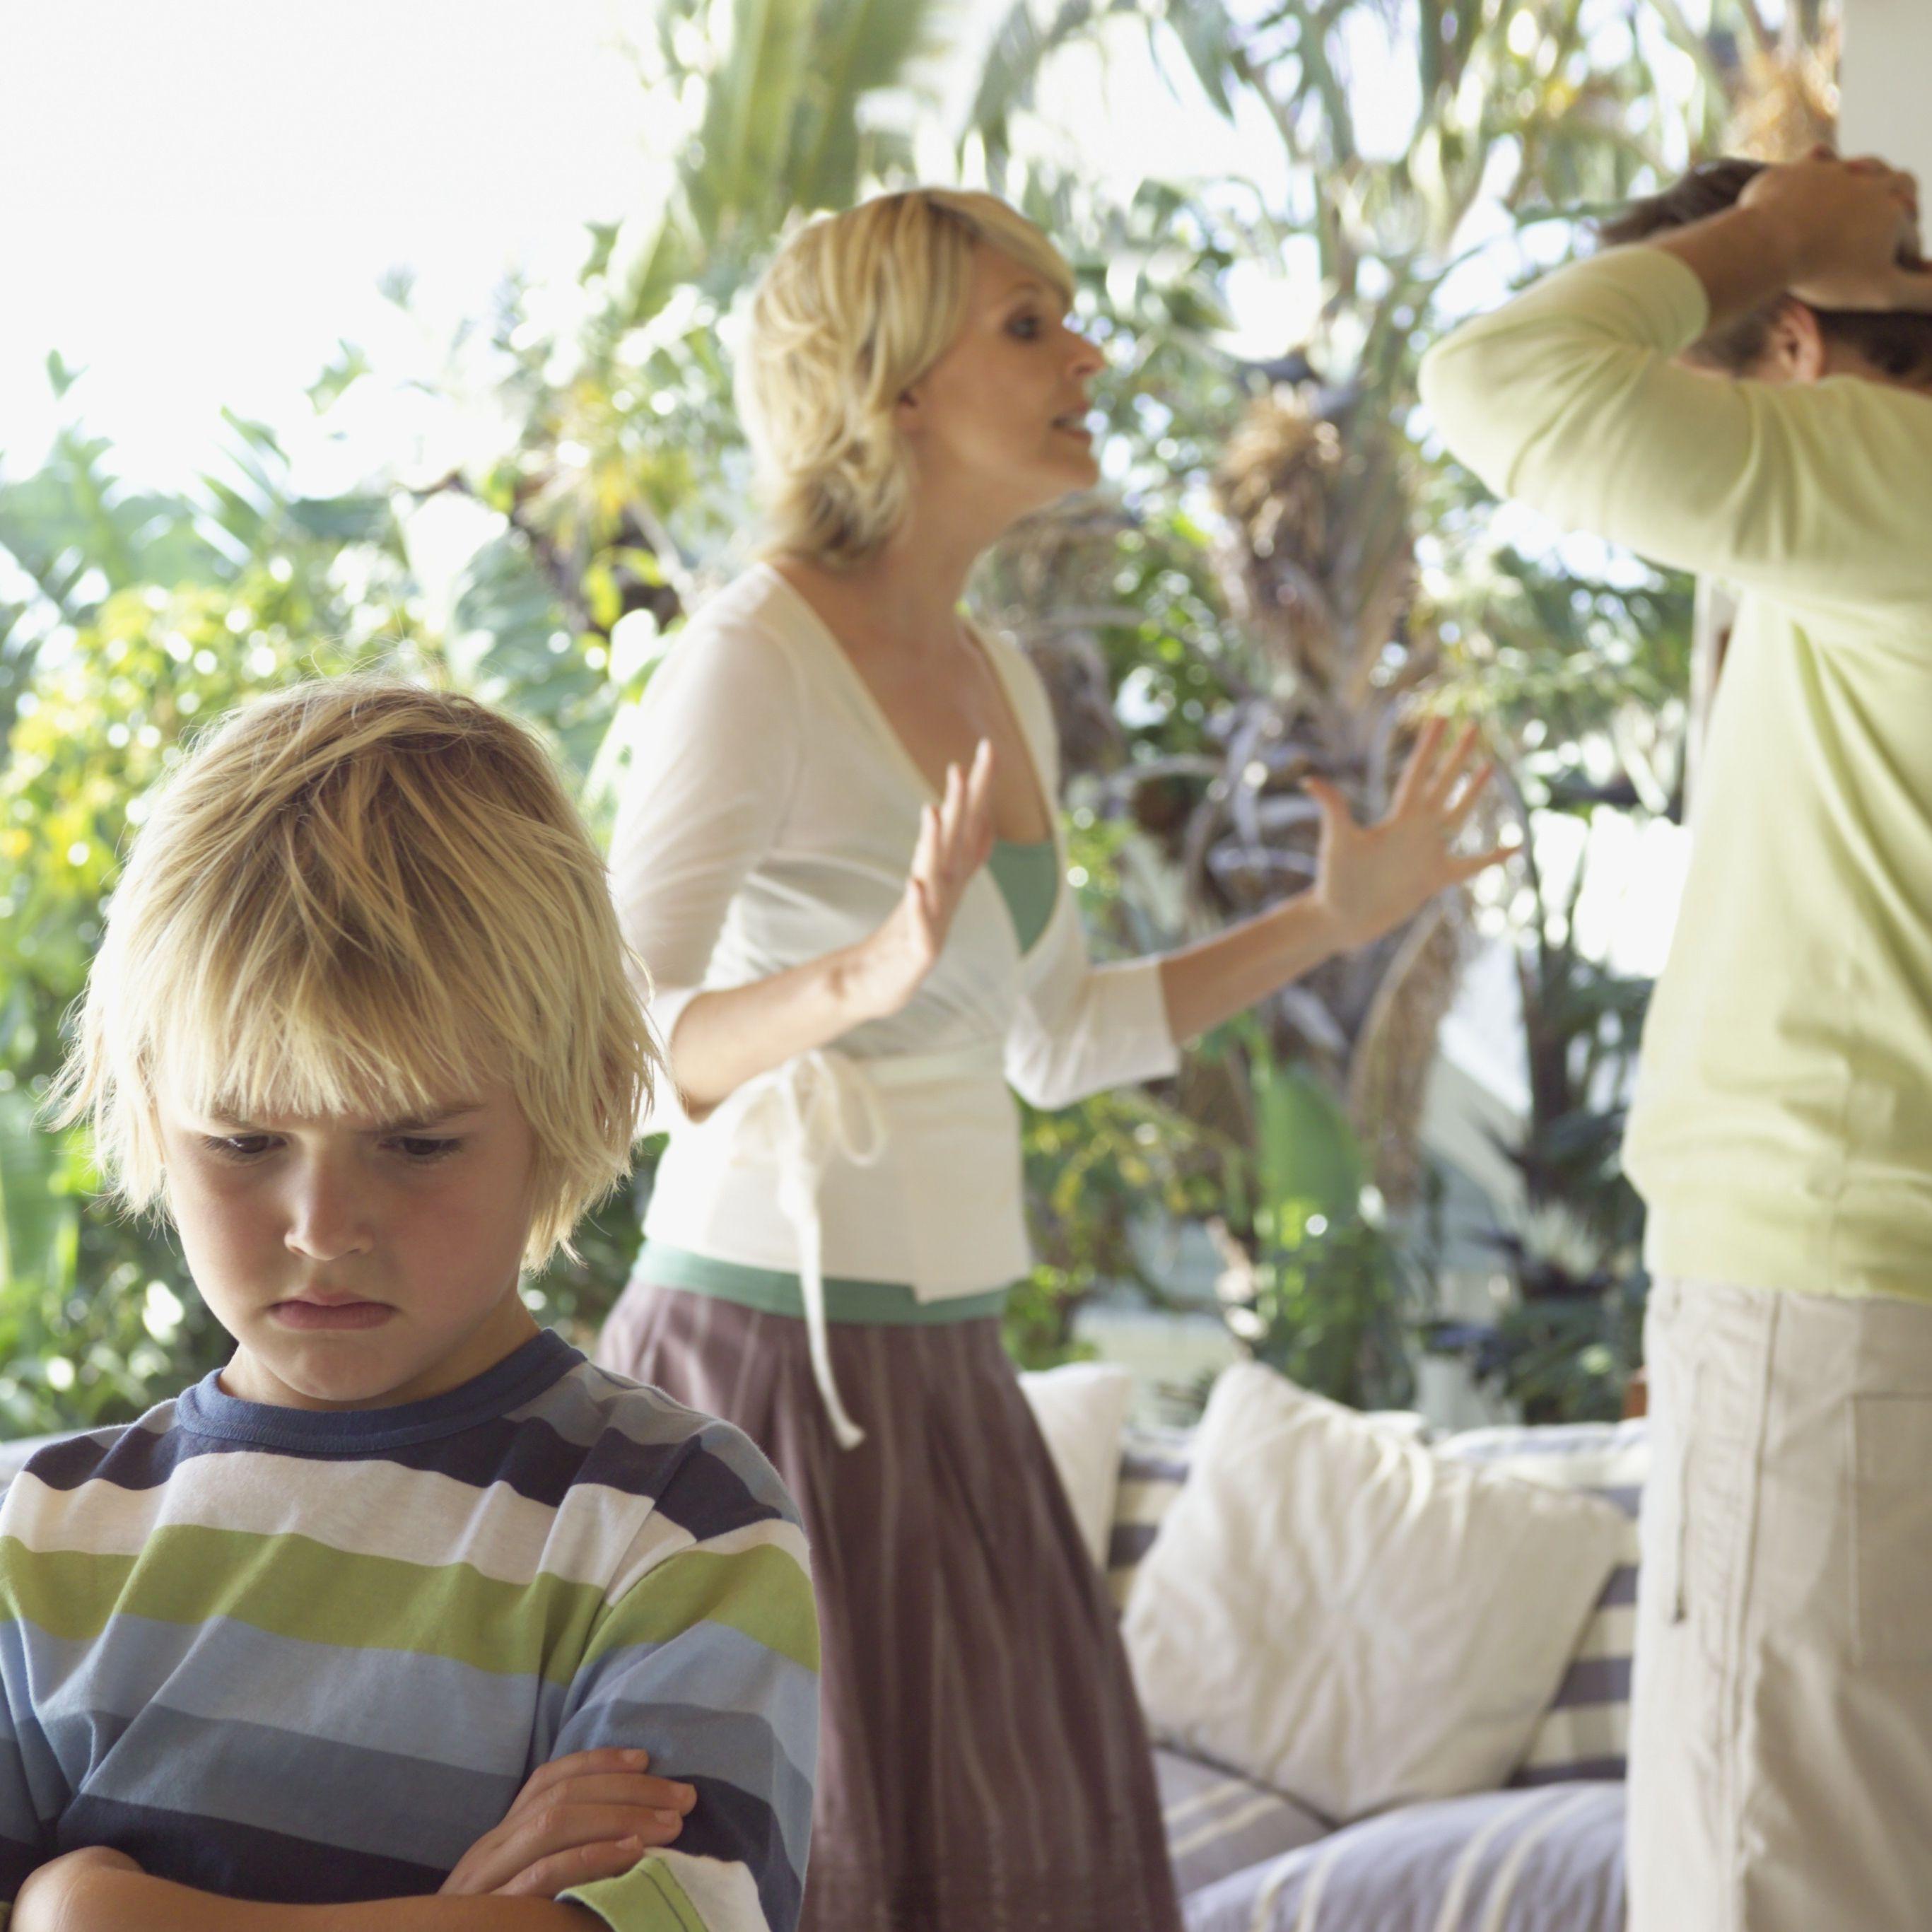 When Parents Disagree on Discipline Style